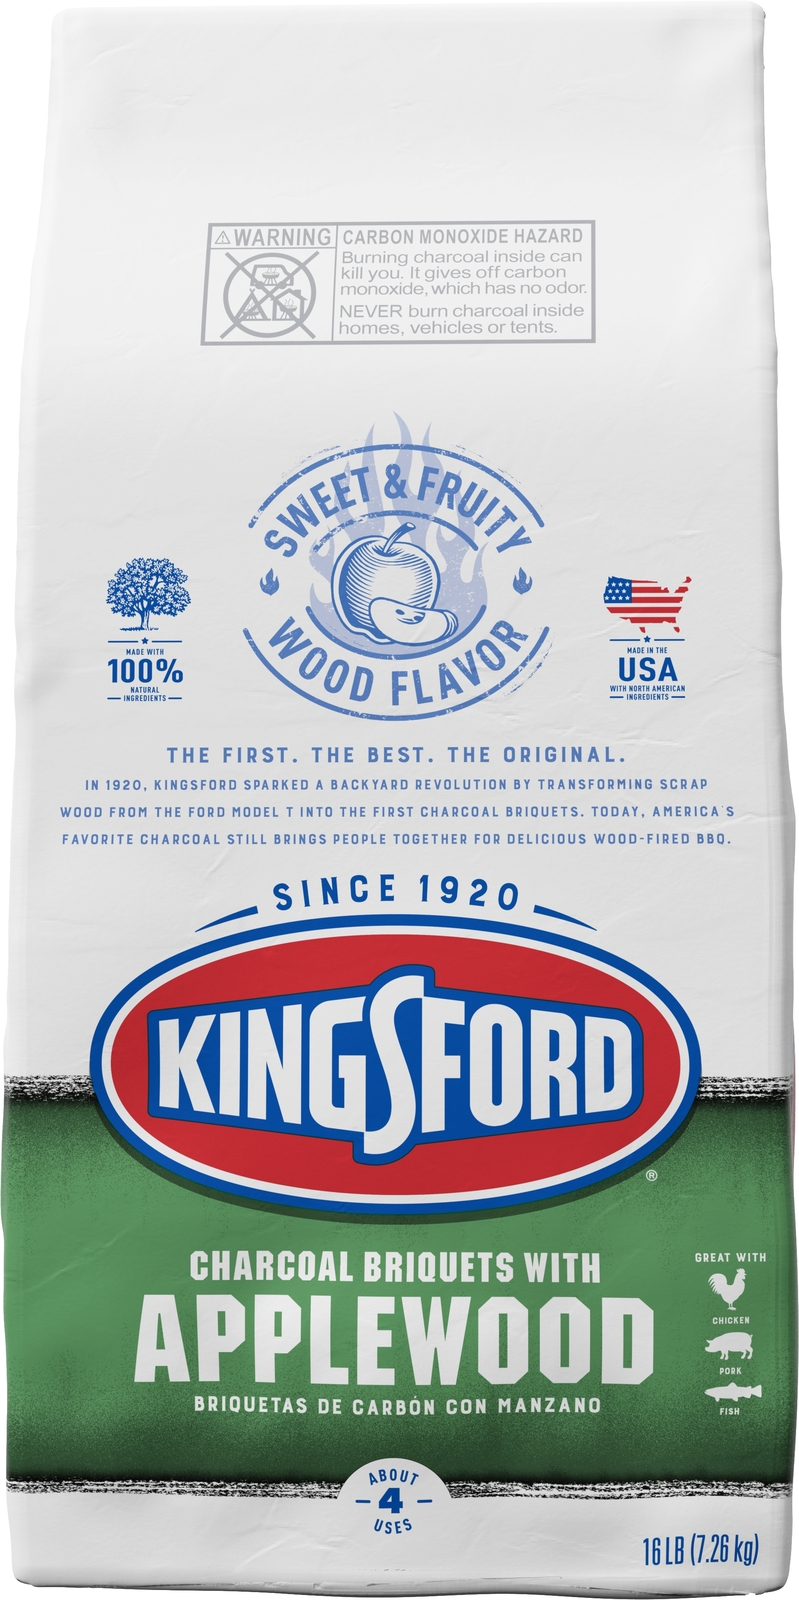 Kingsford *Applewood* Charcoal Briquettes (7.26KG) image